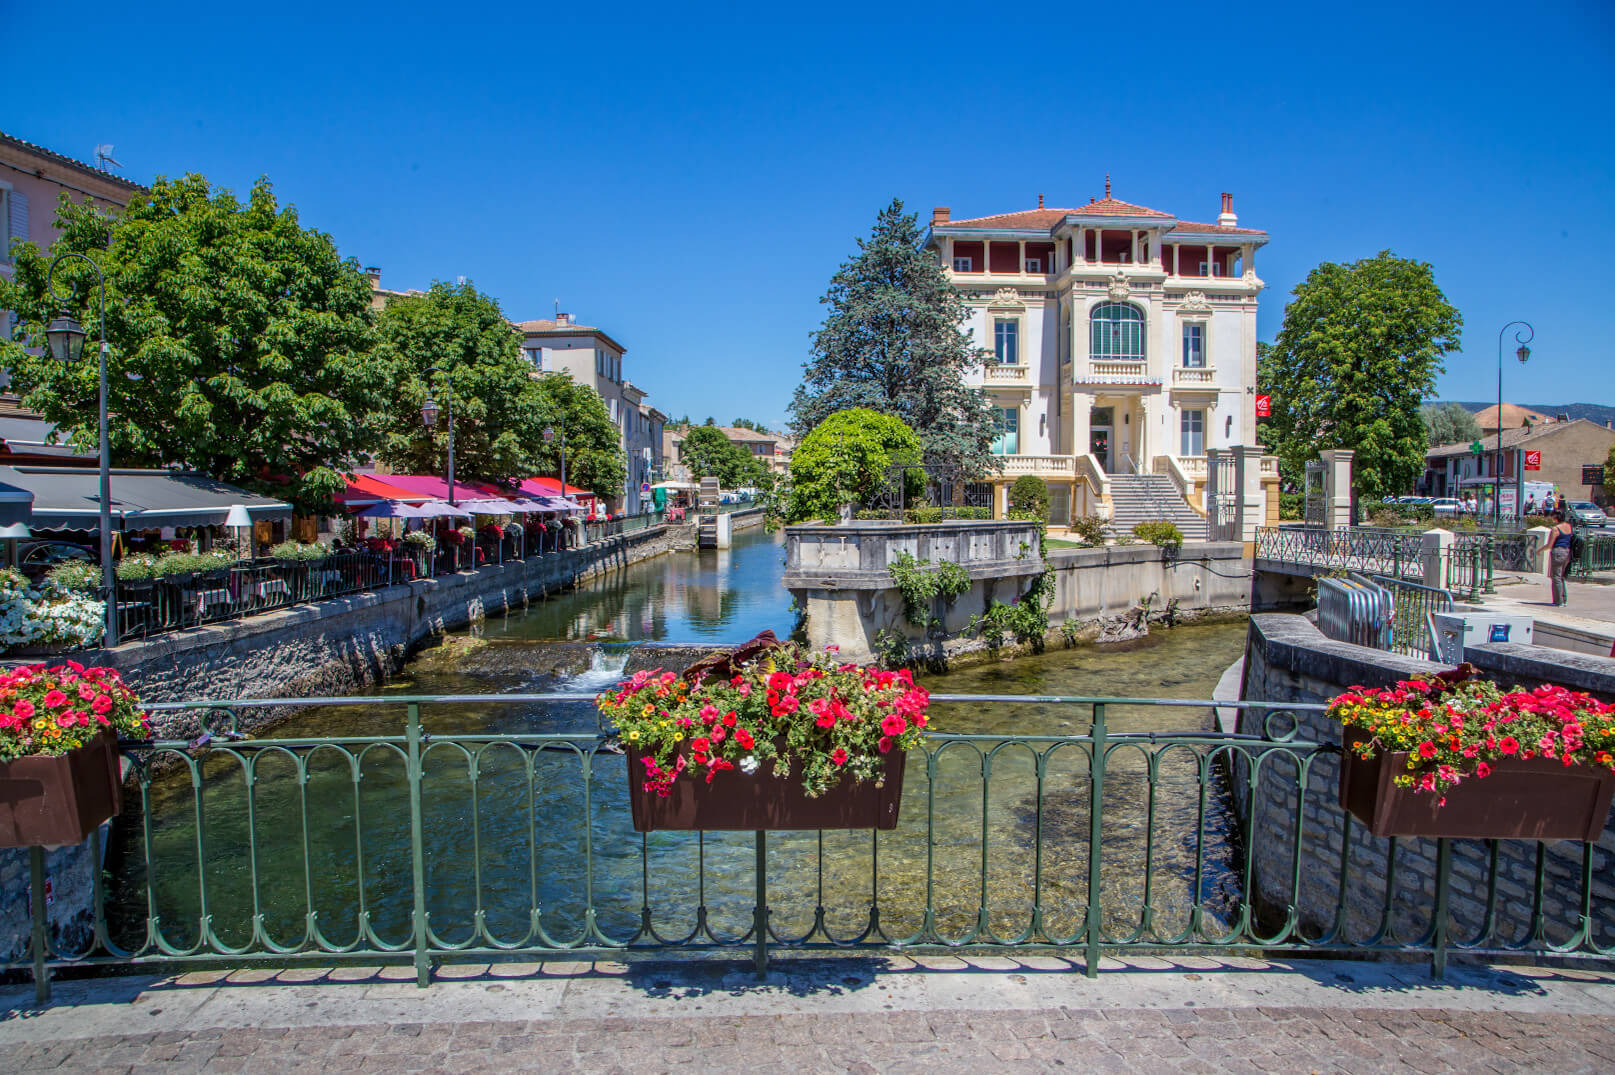 L'Isle-sur-la-Sorgue – La intemporal